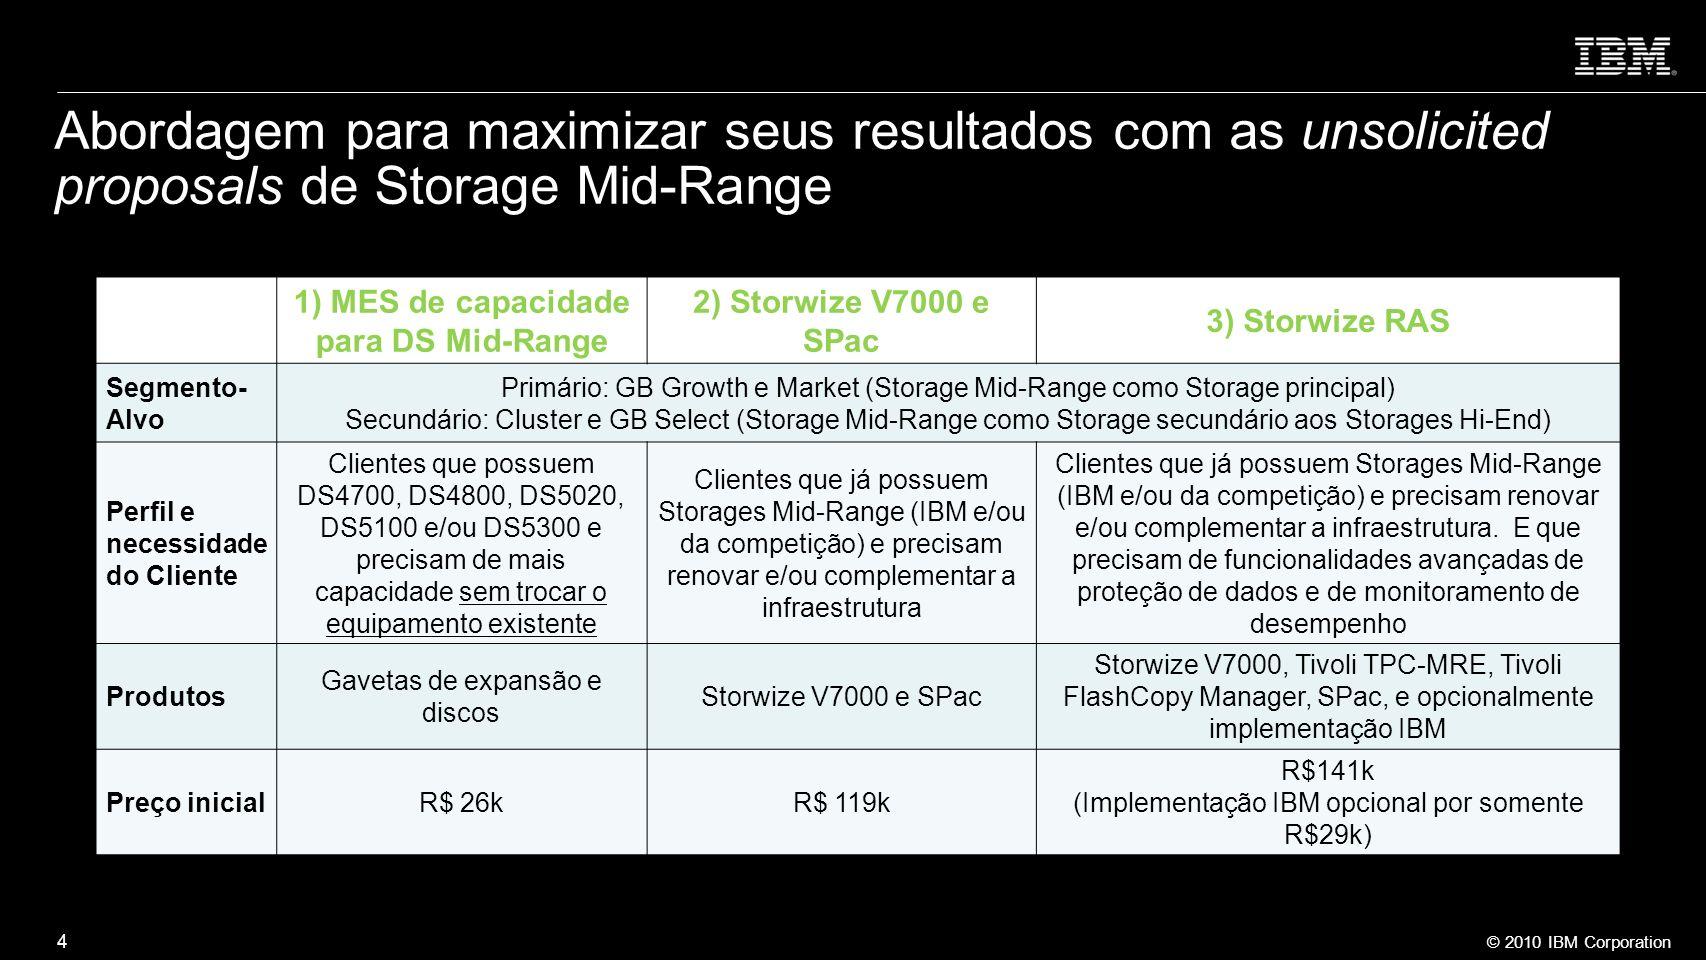 1) MES de capacidade para DS Mid-Range